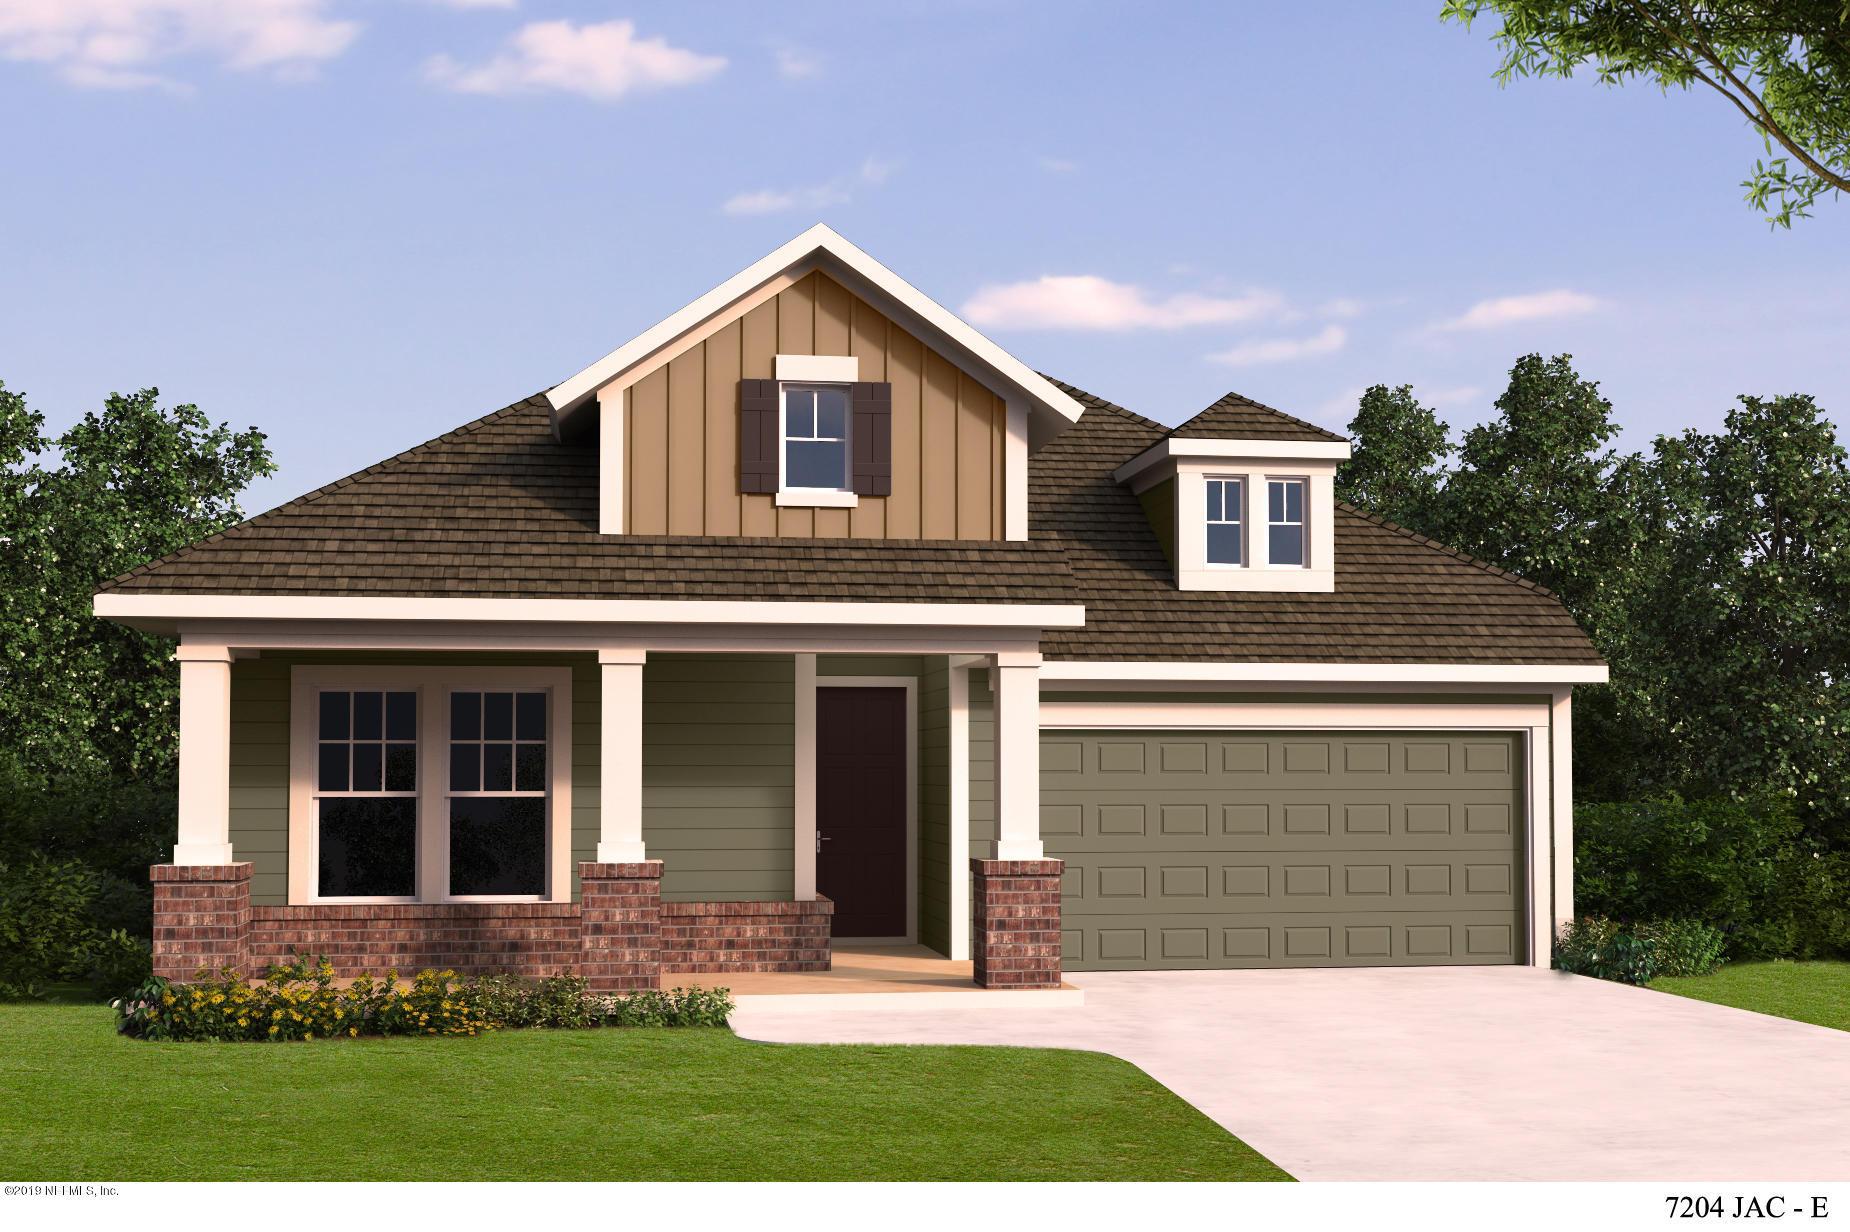 40 ROCKHURST, PONTE VEDRA, FLORIDA 32081, 3 Bedrooms Bedrooms, ,2 BathroomsBathrooms,Residential - single family,For sale,ROCKHURST,976342